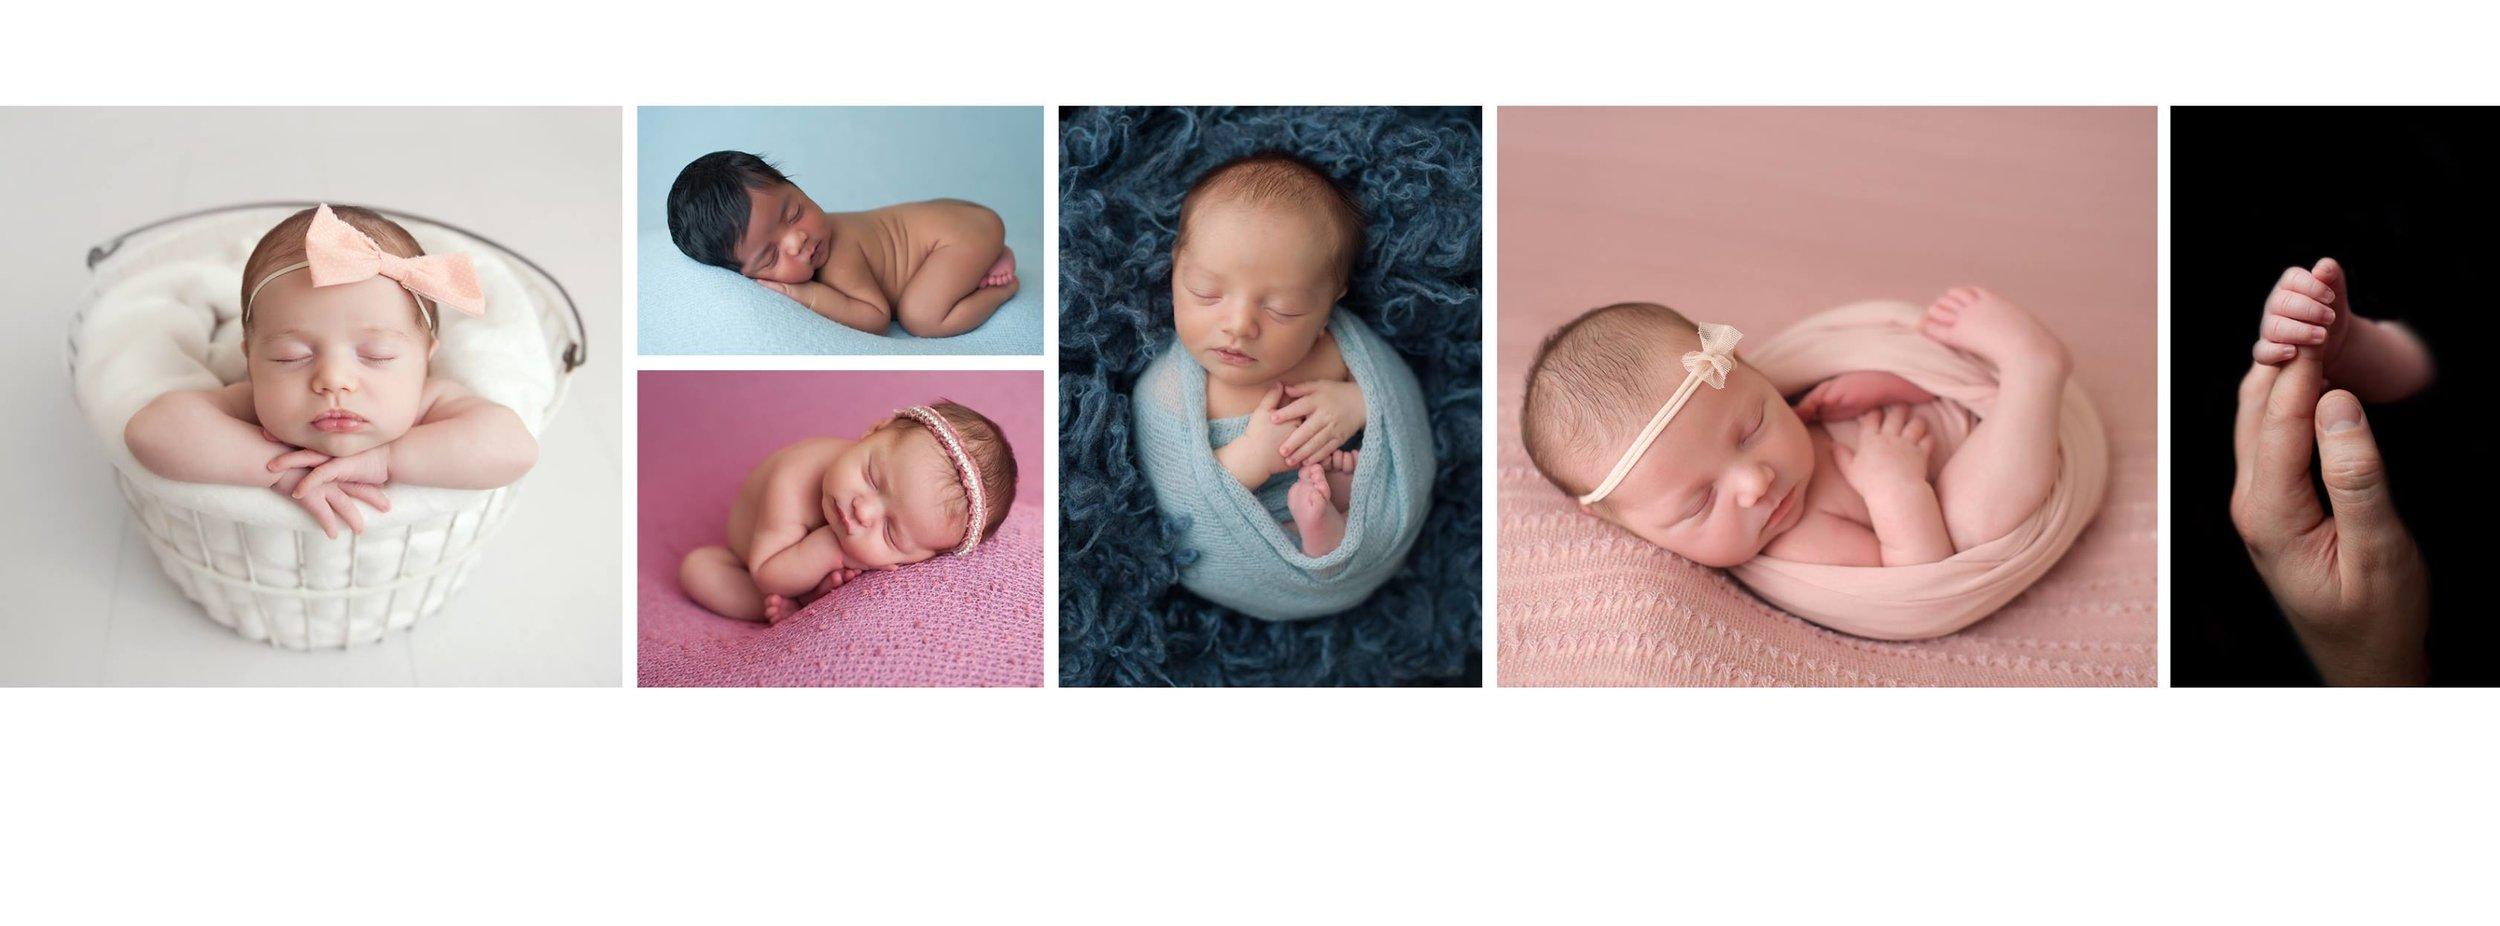 Brand New Beautiful Newborns Photographed in Maryland